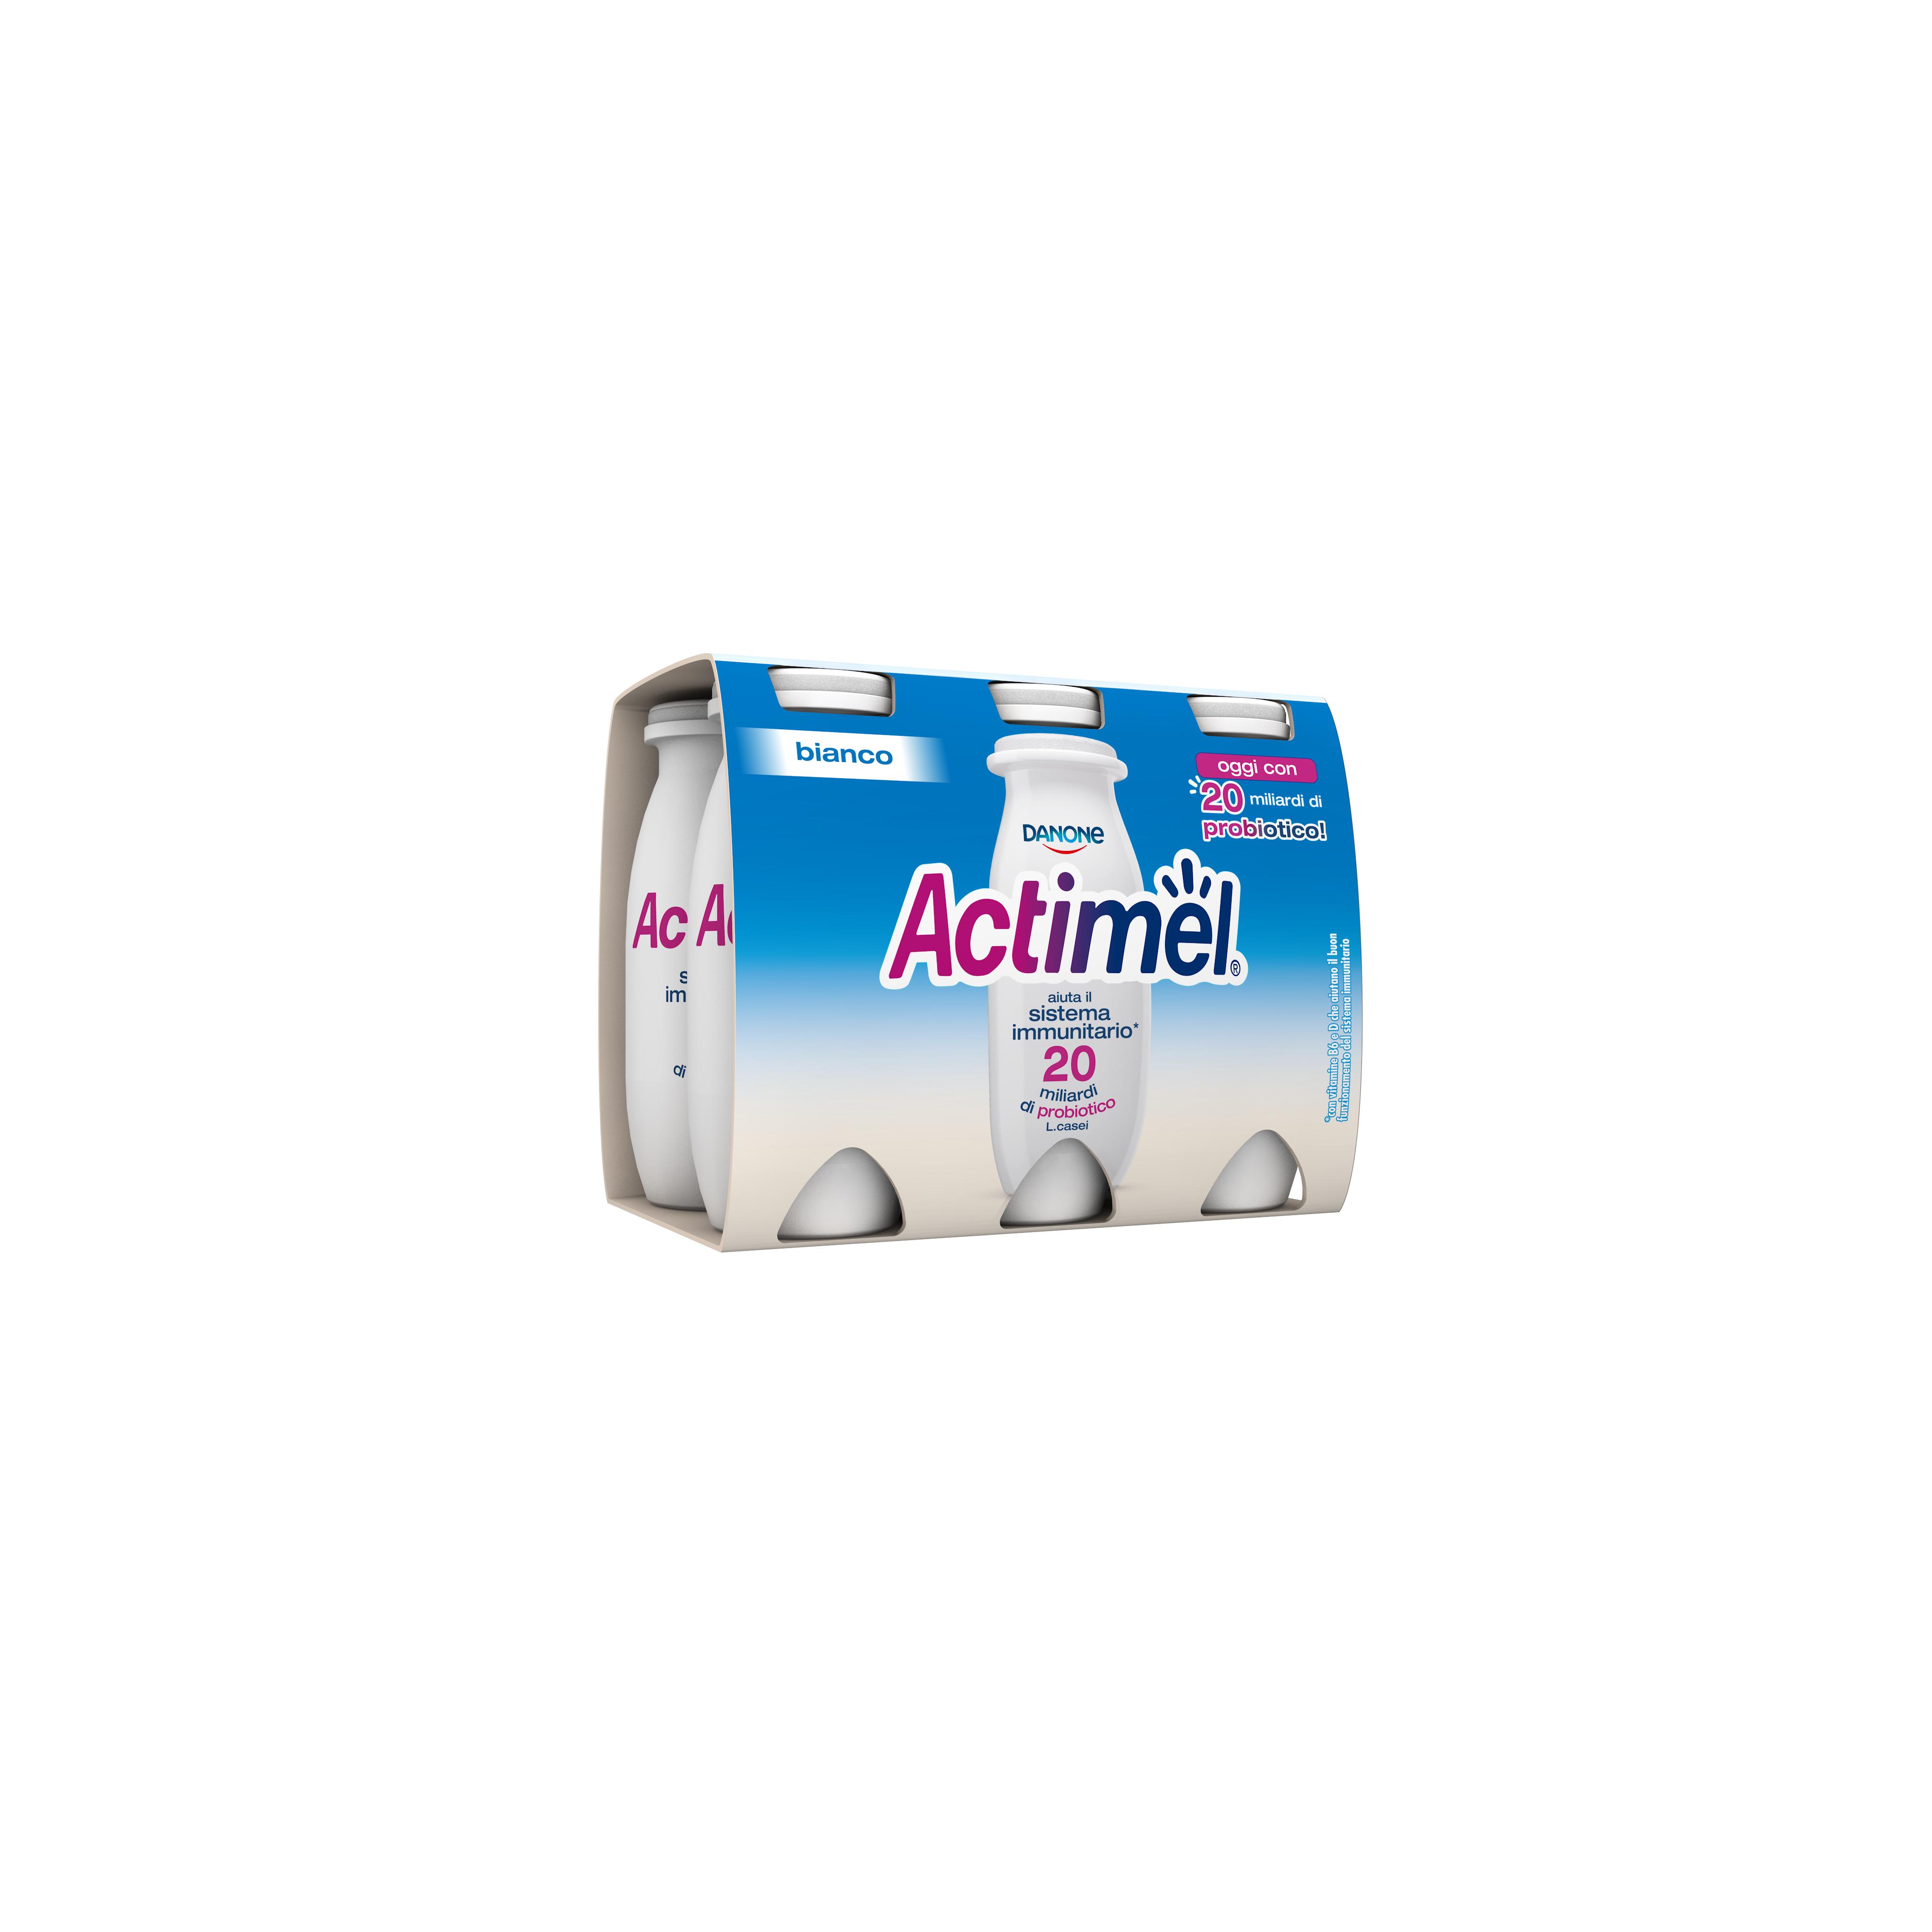 ACTIMEL DANONE 100GX6 BIANCO